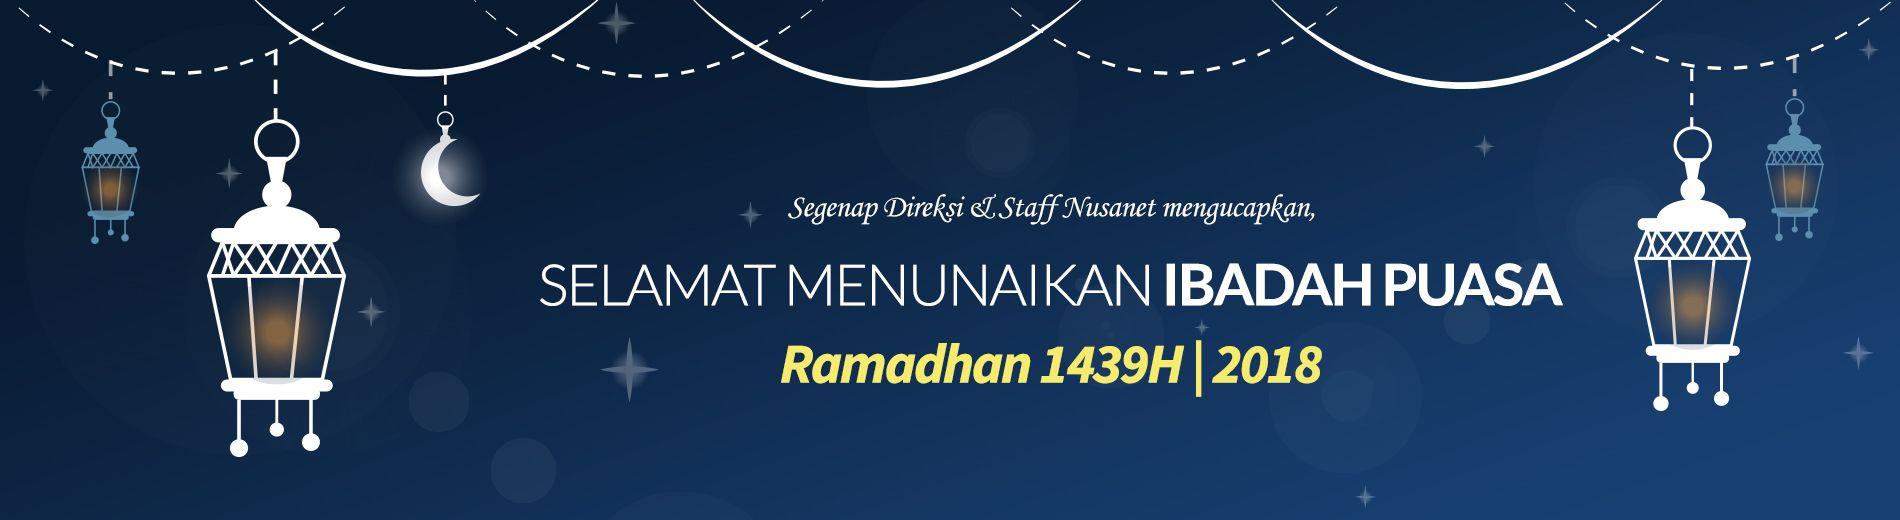 banner-ramadhan-compressor